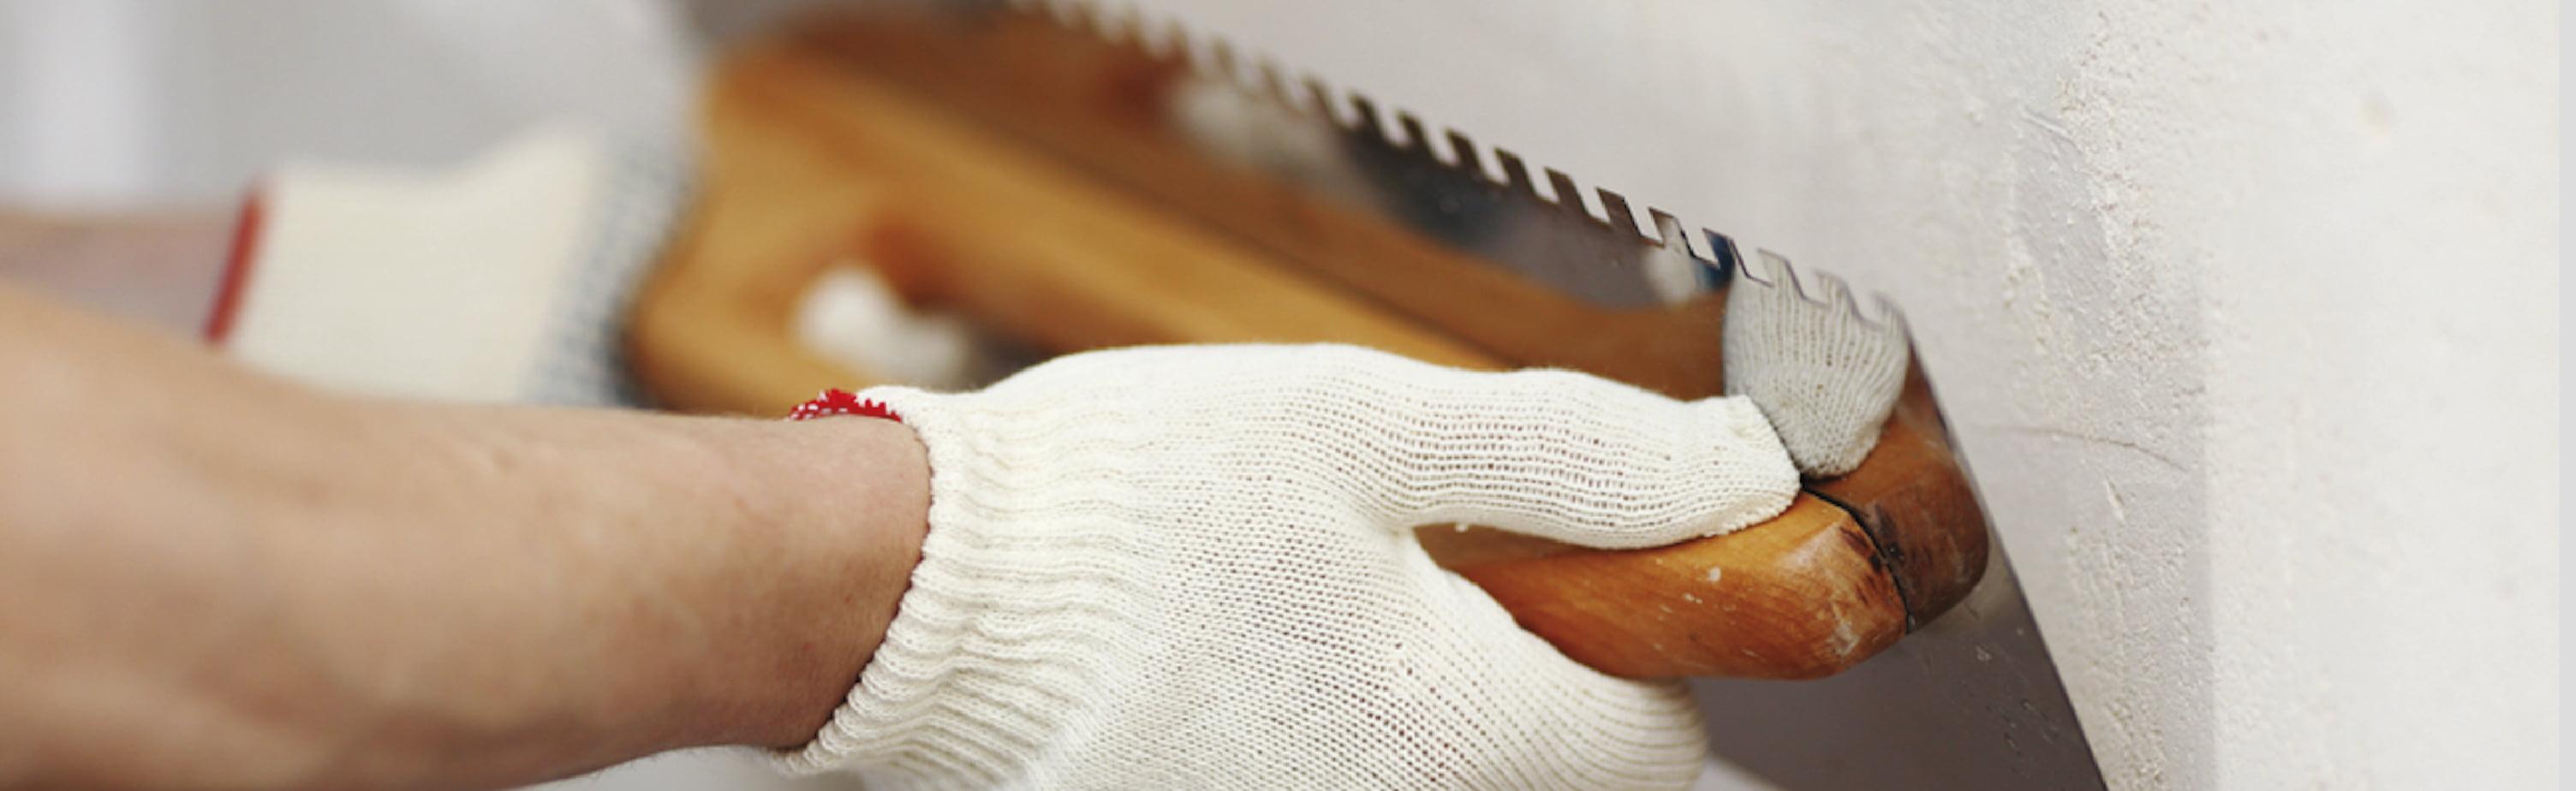 Remontointi ja vahinkosaneeraus